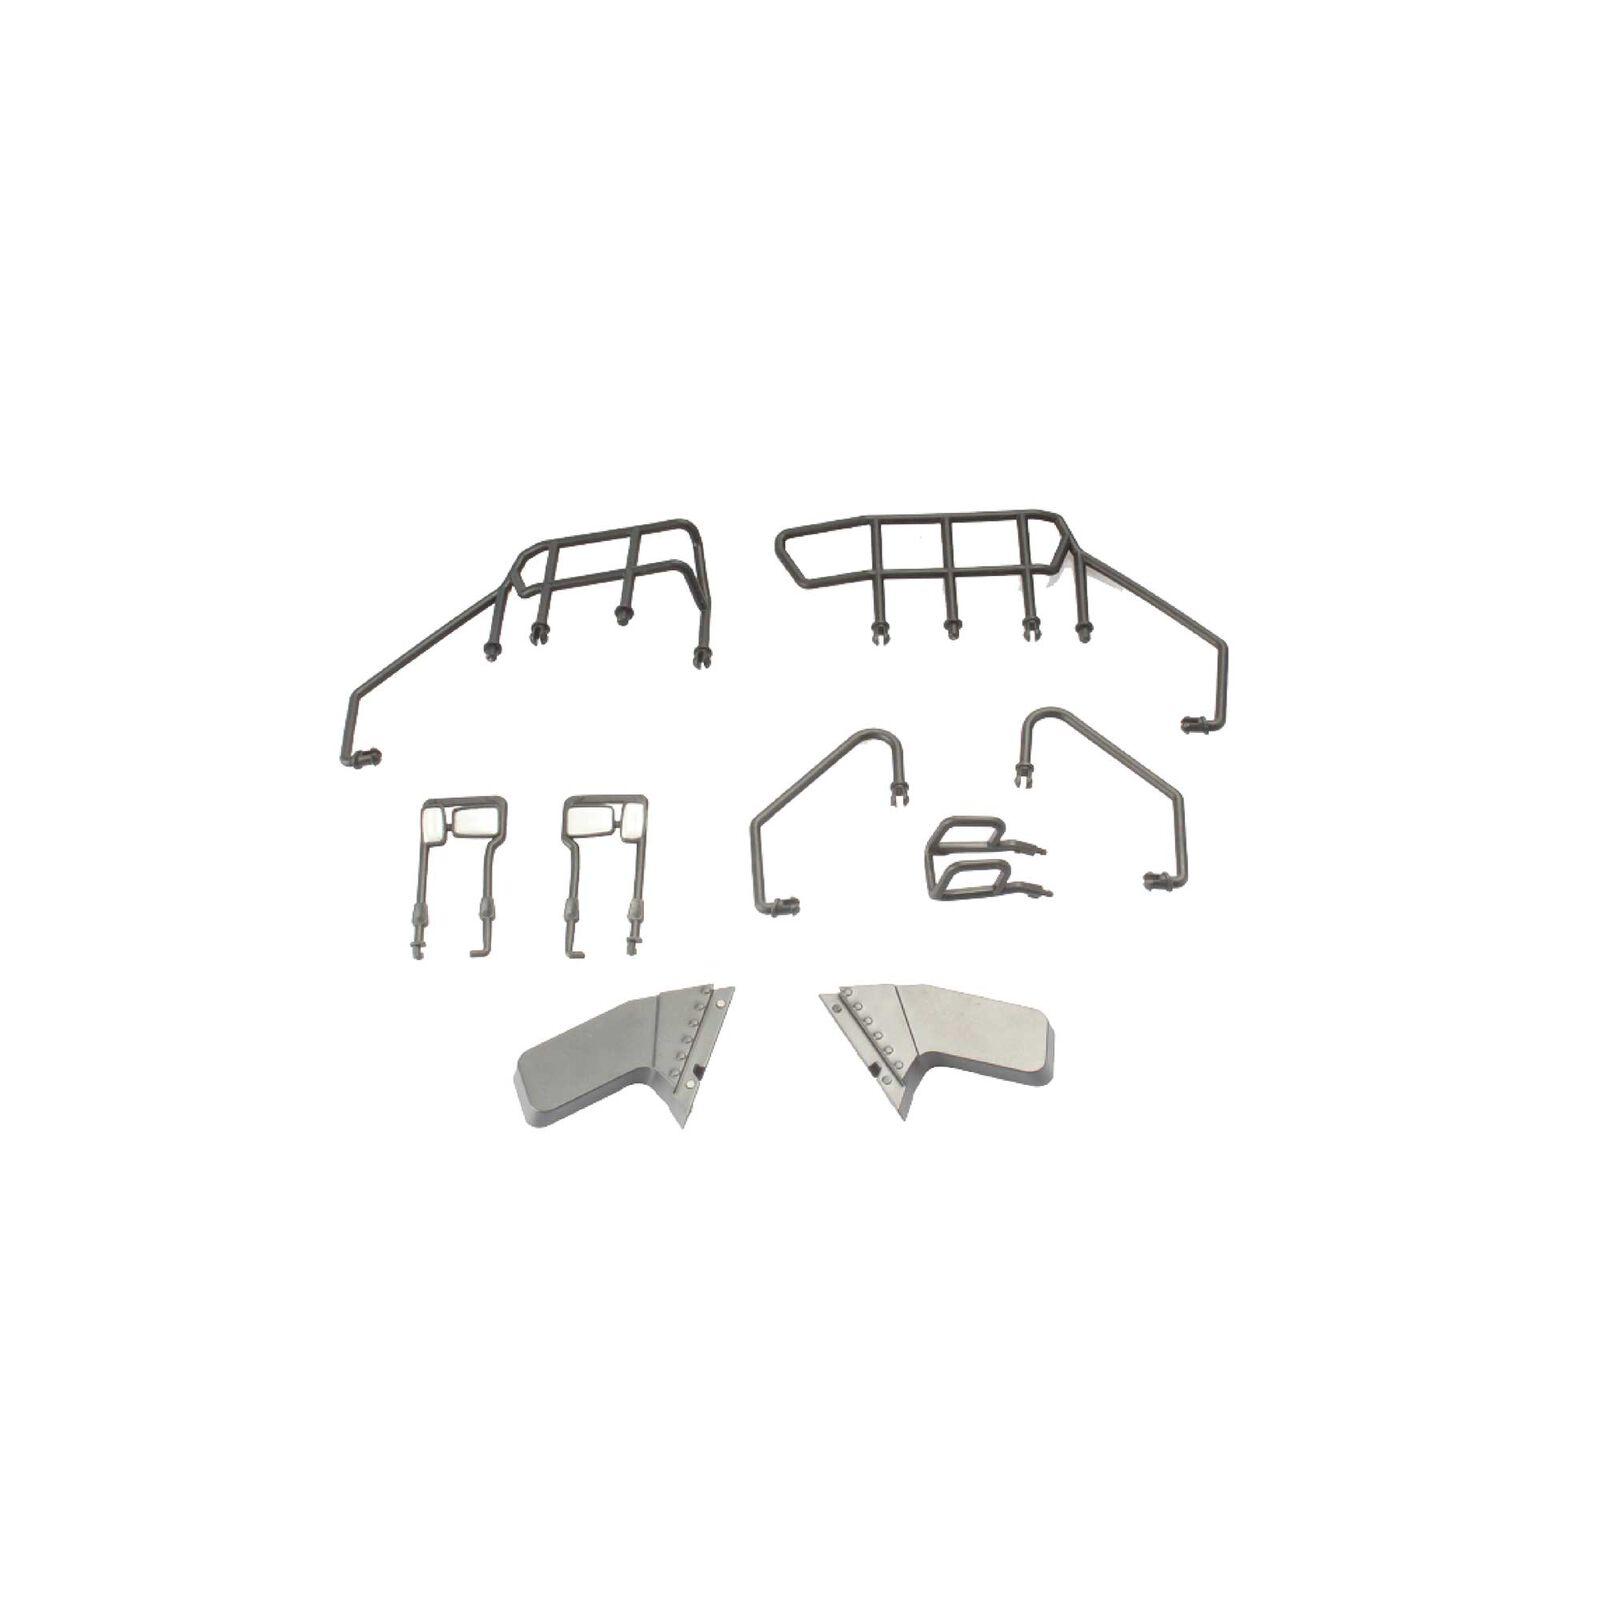 Handrail Mirror Fender Kit: Caterpillar Articulated Truck